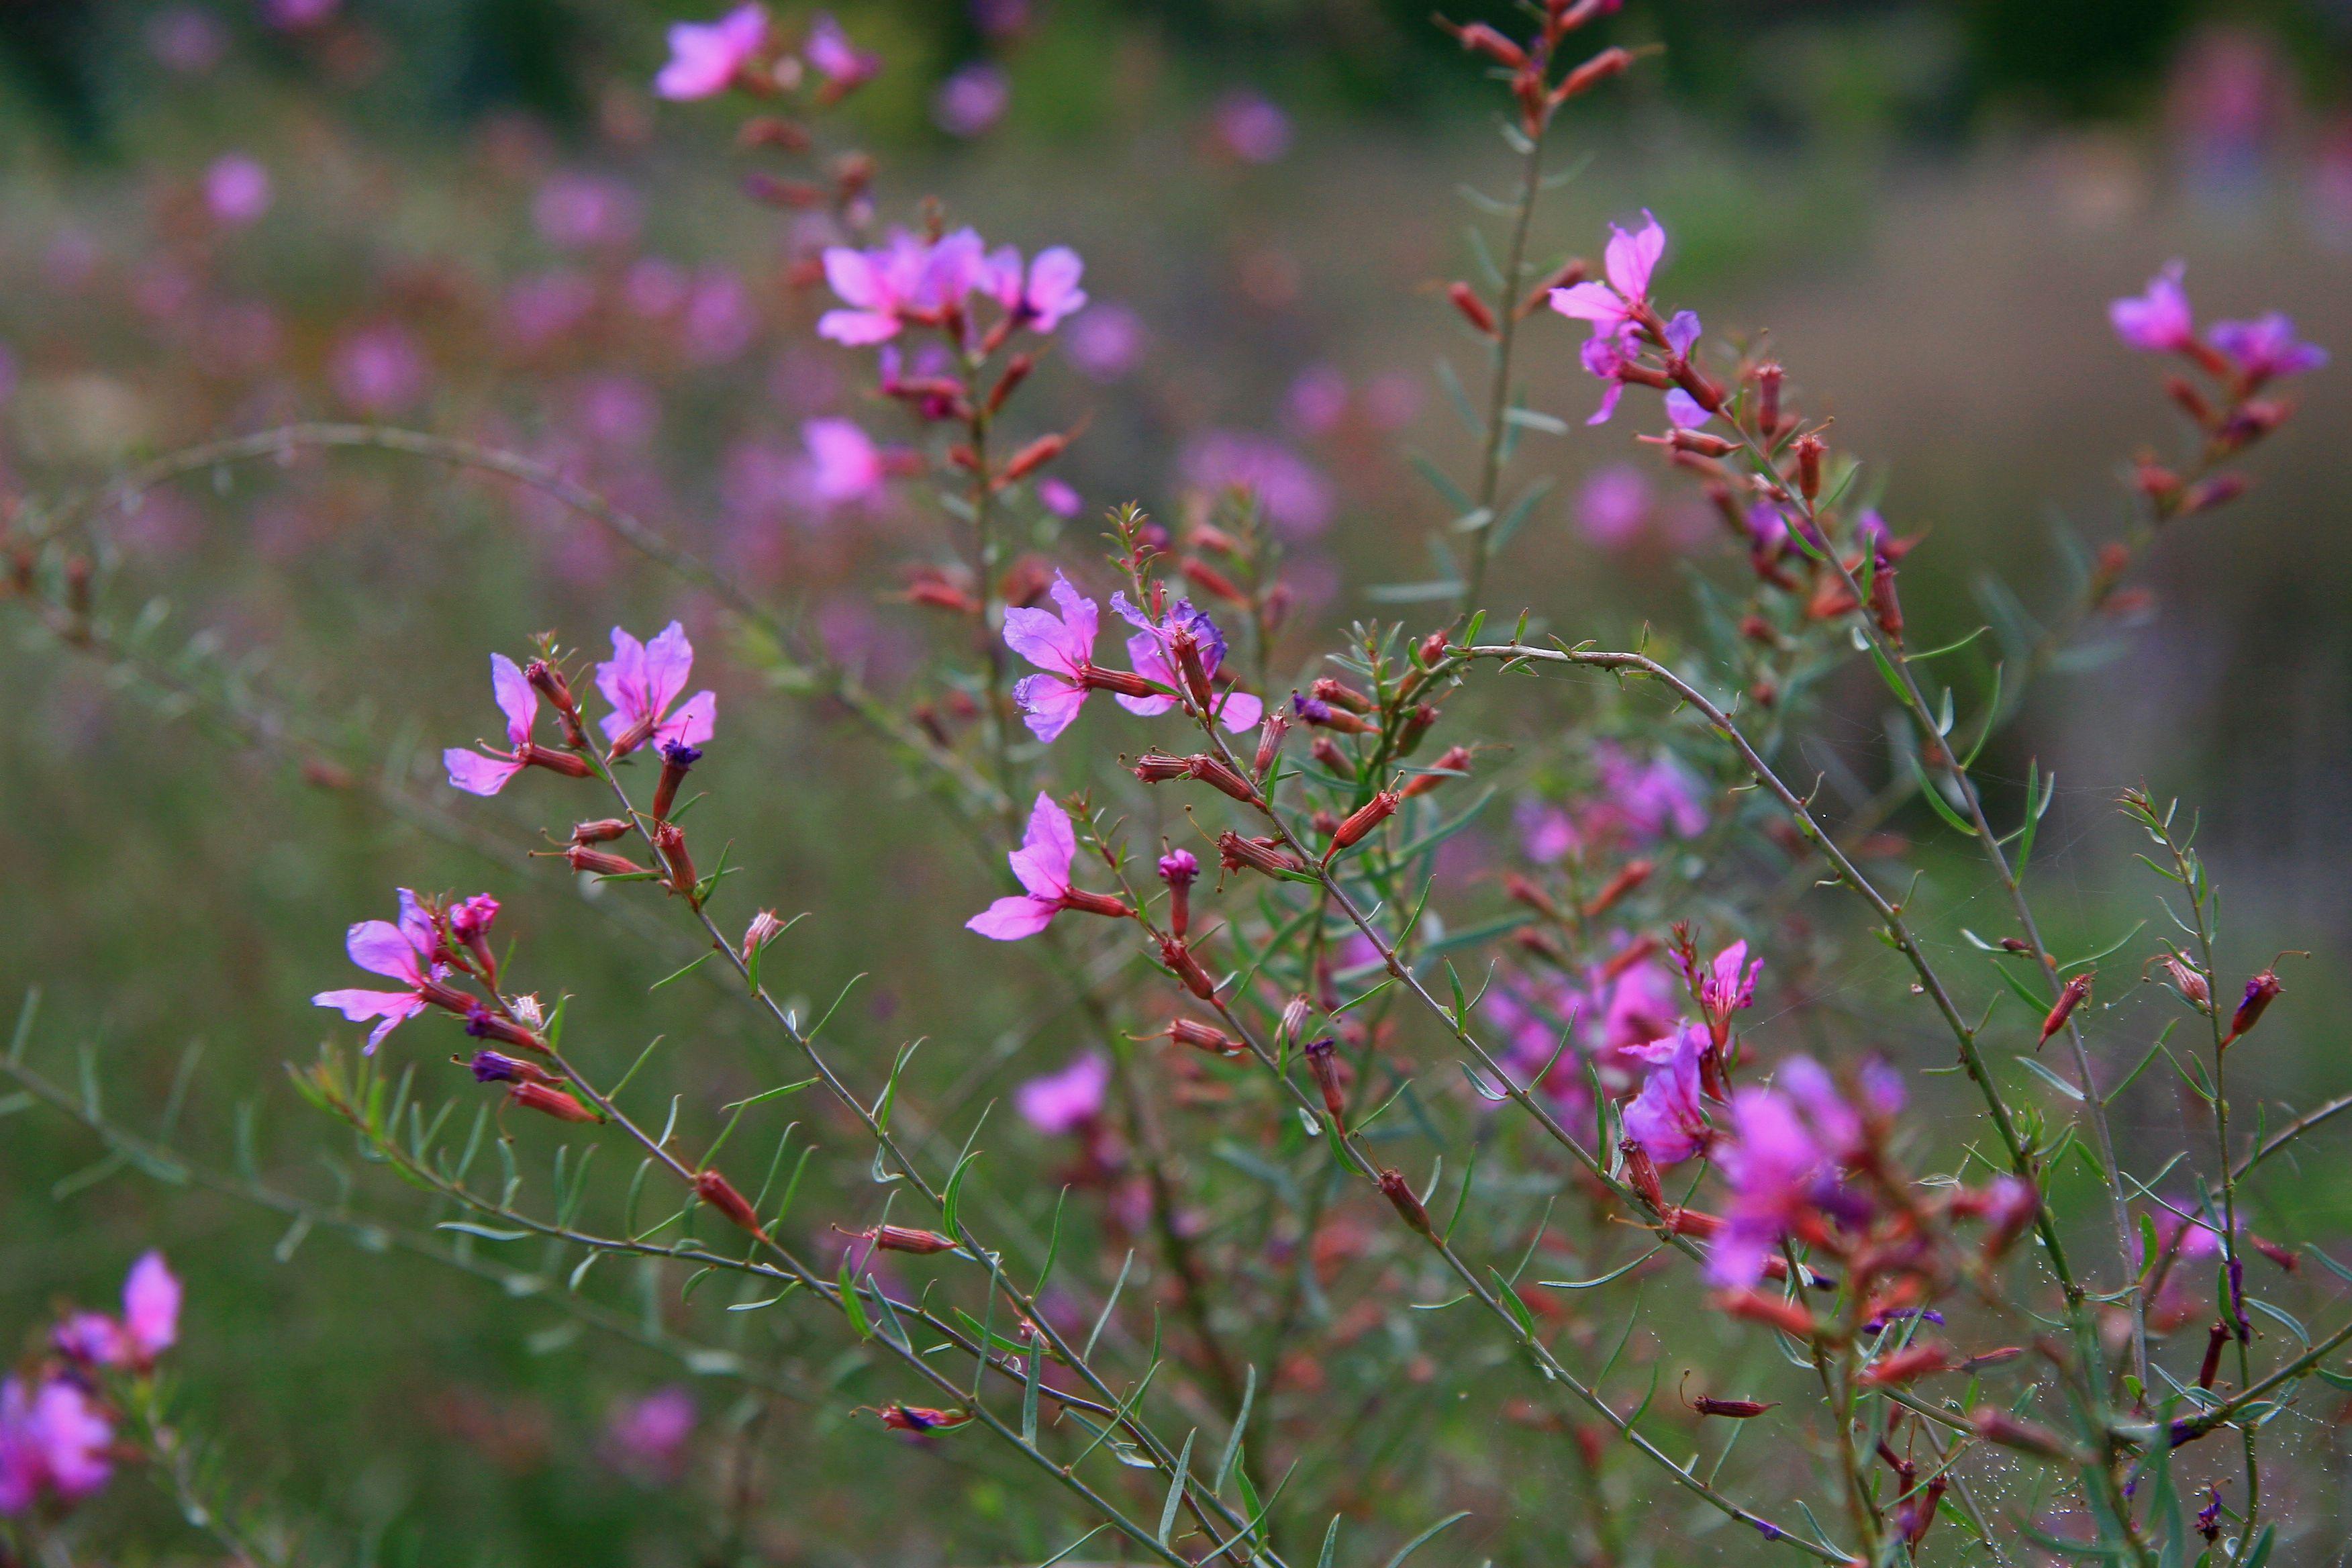 Lythrum virgatum swirl vlinderhof m ximapark utrecht for Designing with plants oudolf